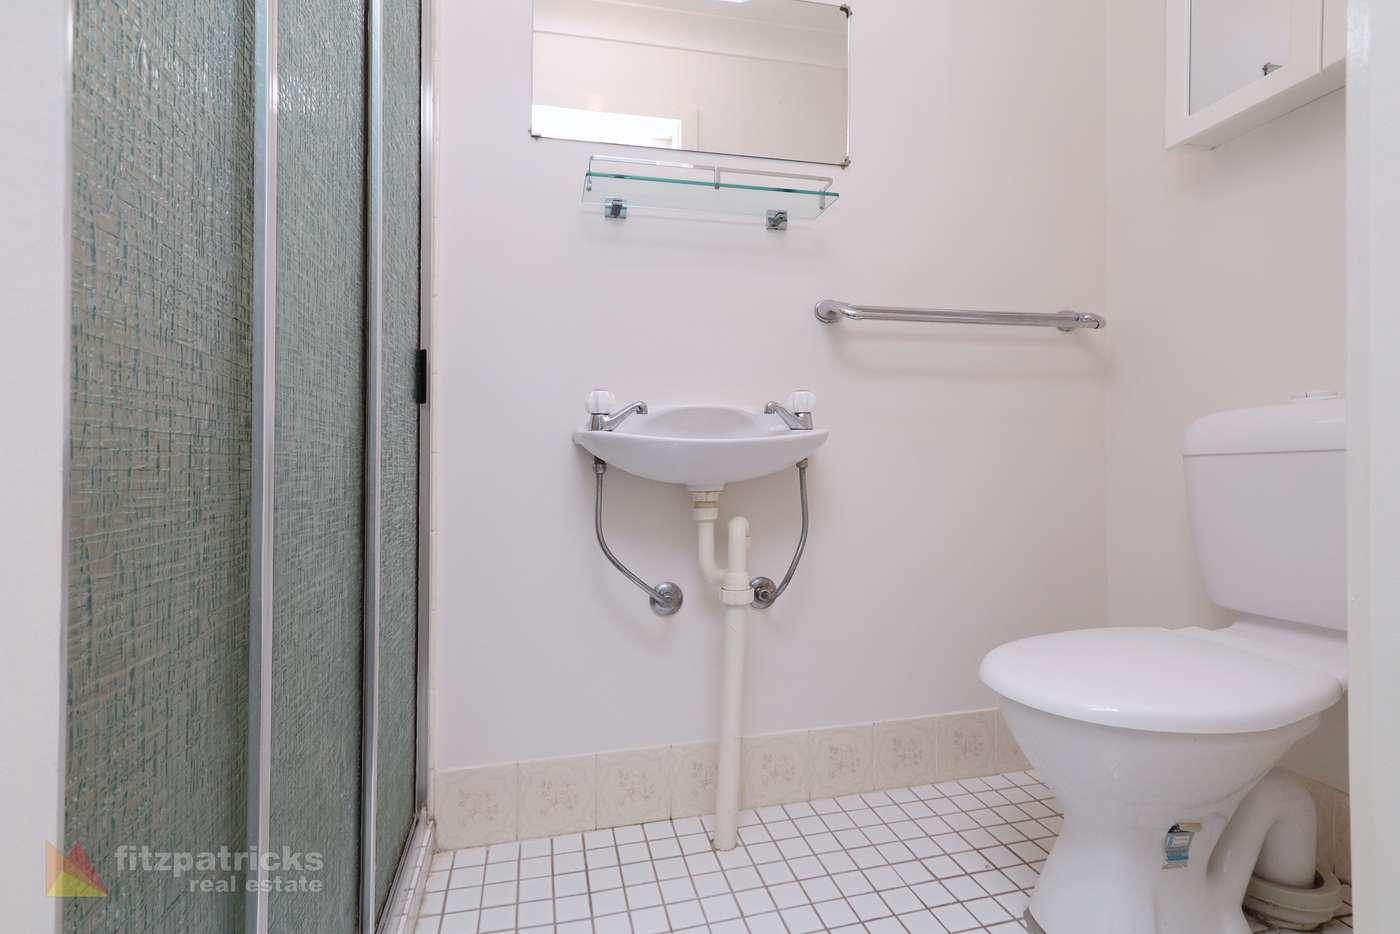 Sixth view of Homely house listing, 178 Gurwood Street, Wagga Wagga NSW 2650